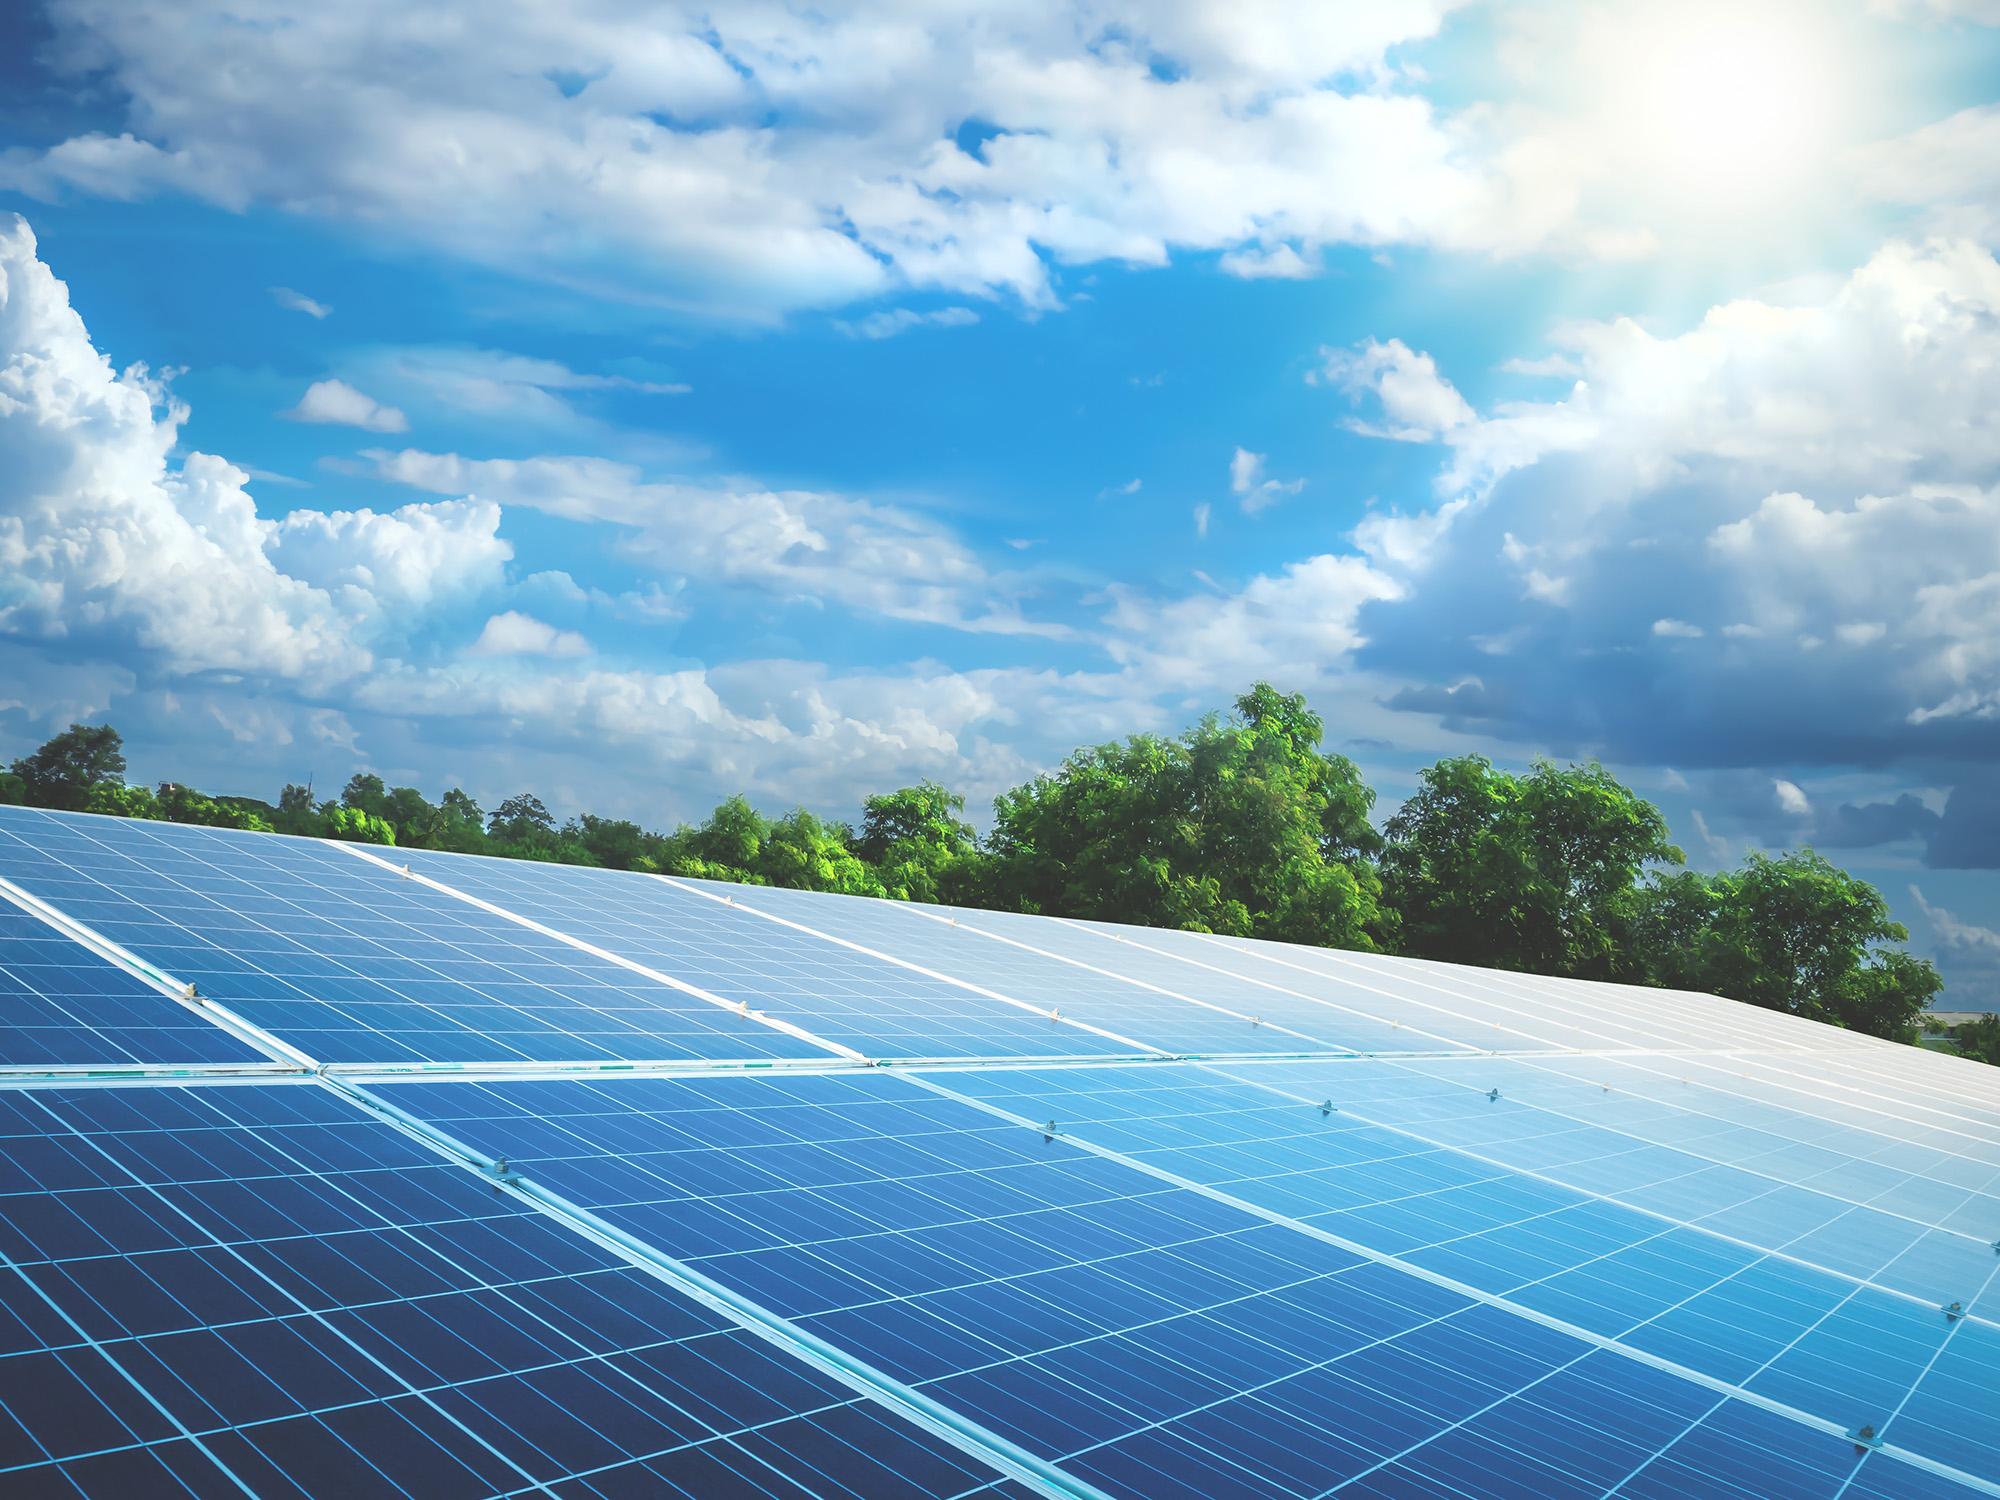 Solarpark in der Landschaft